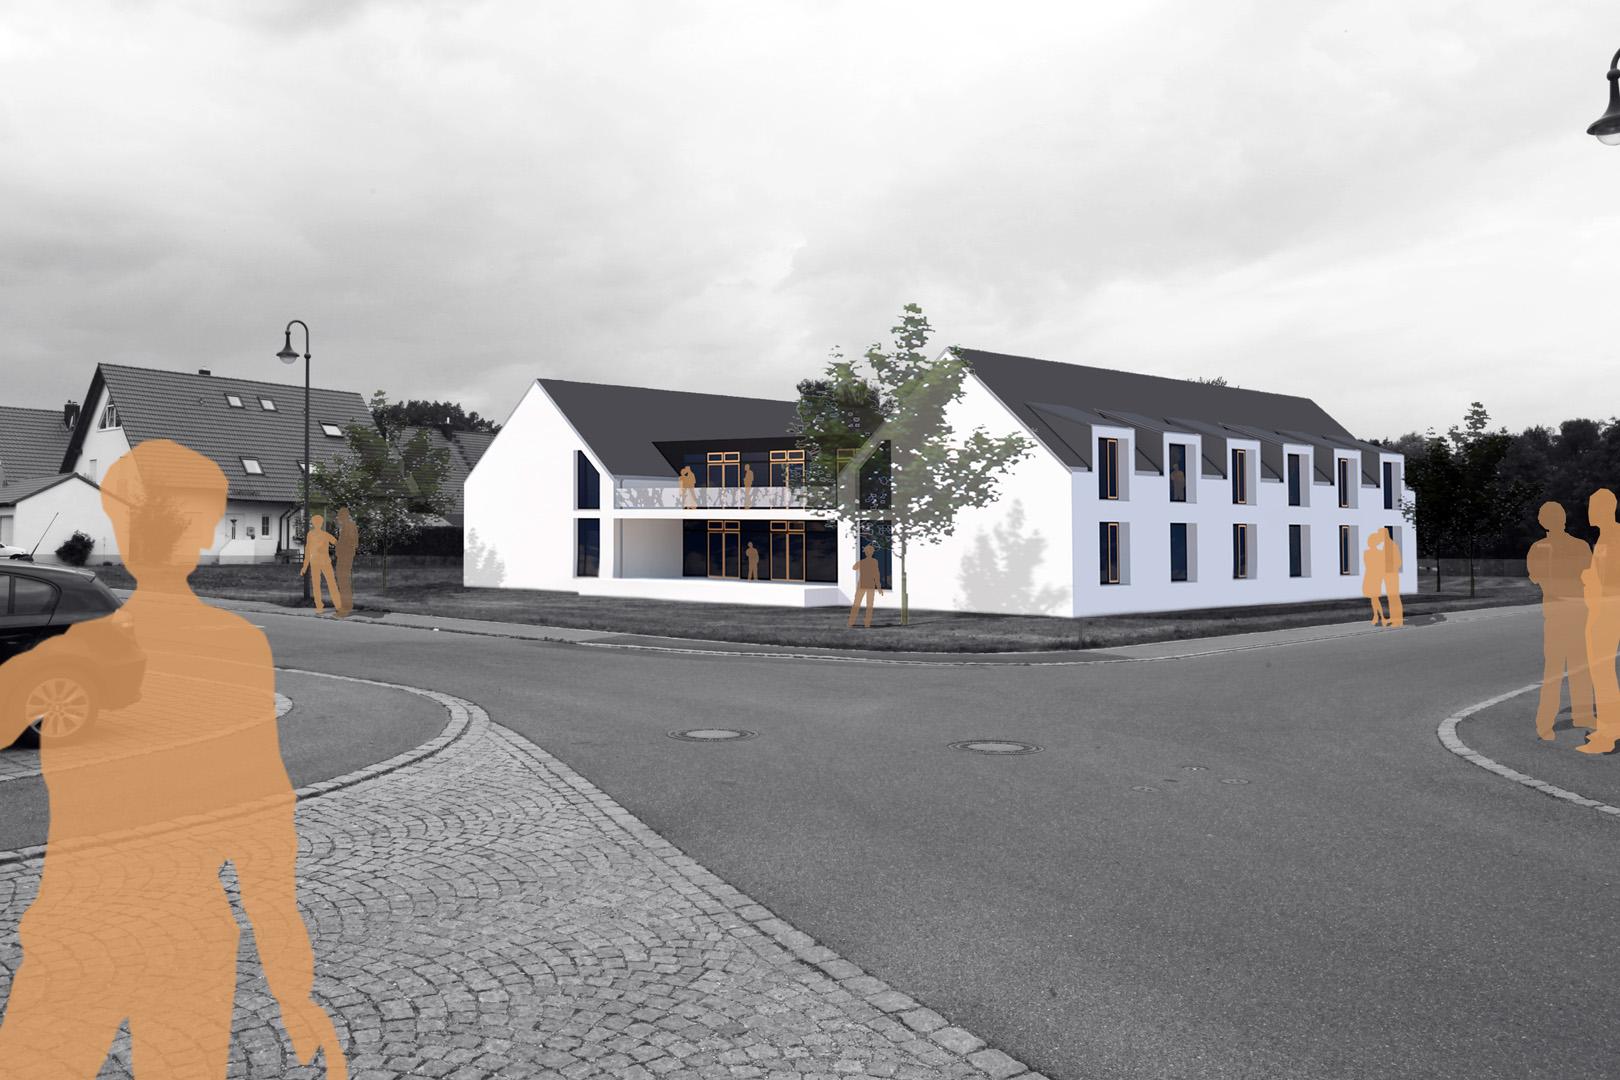 Wohnen für Demente in Burgau: Planung 2011 / BRI ca. 7.300m³ / BGF ca. 850m²